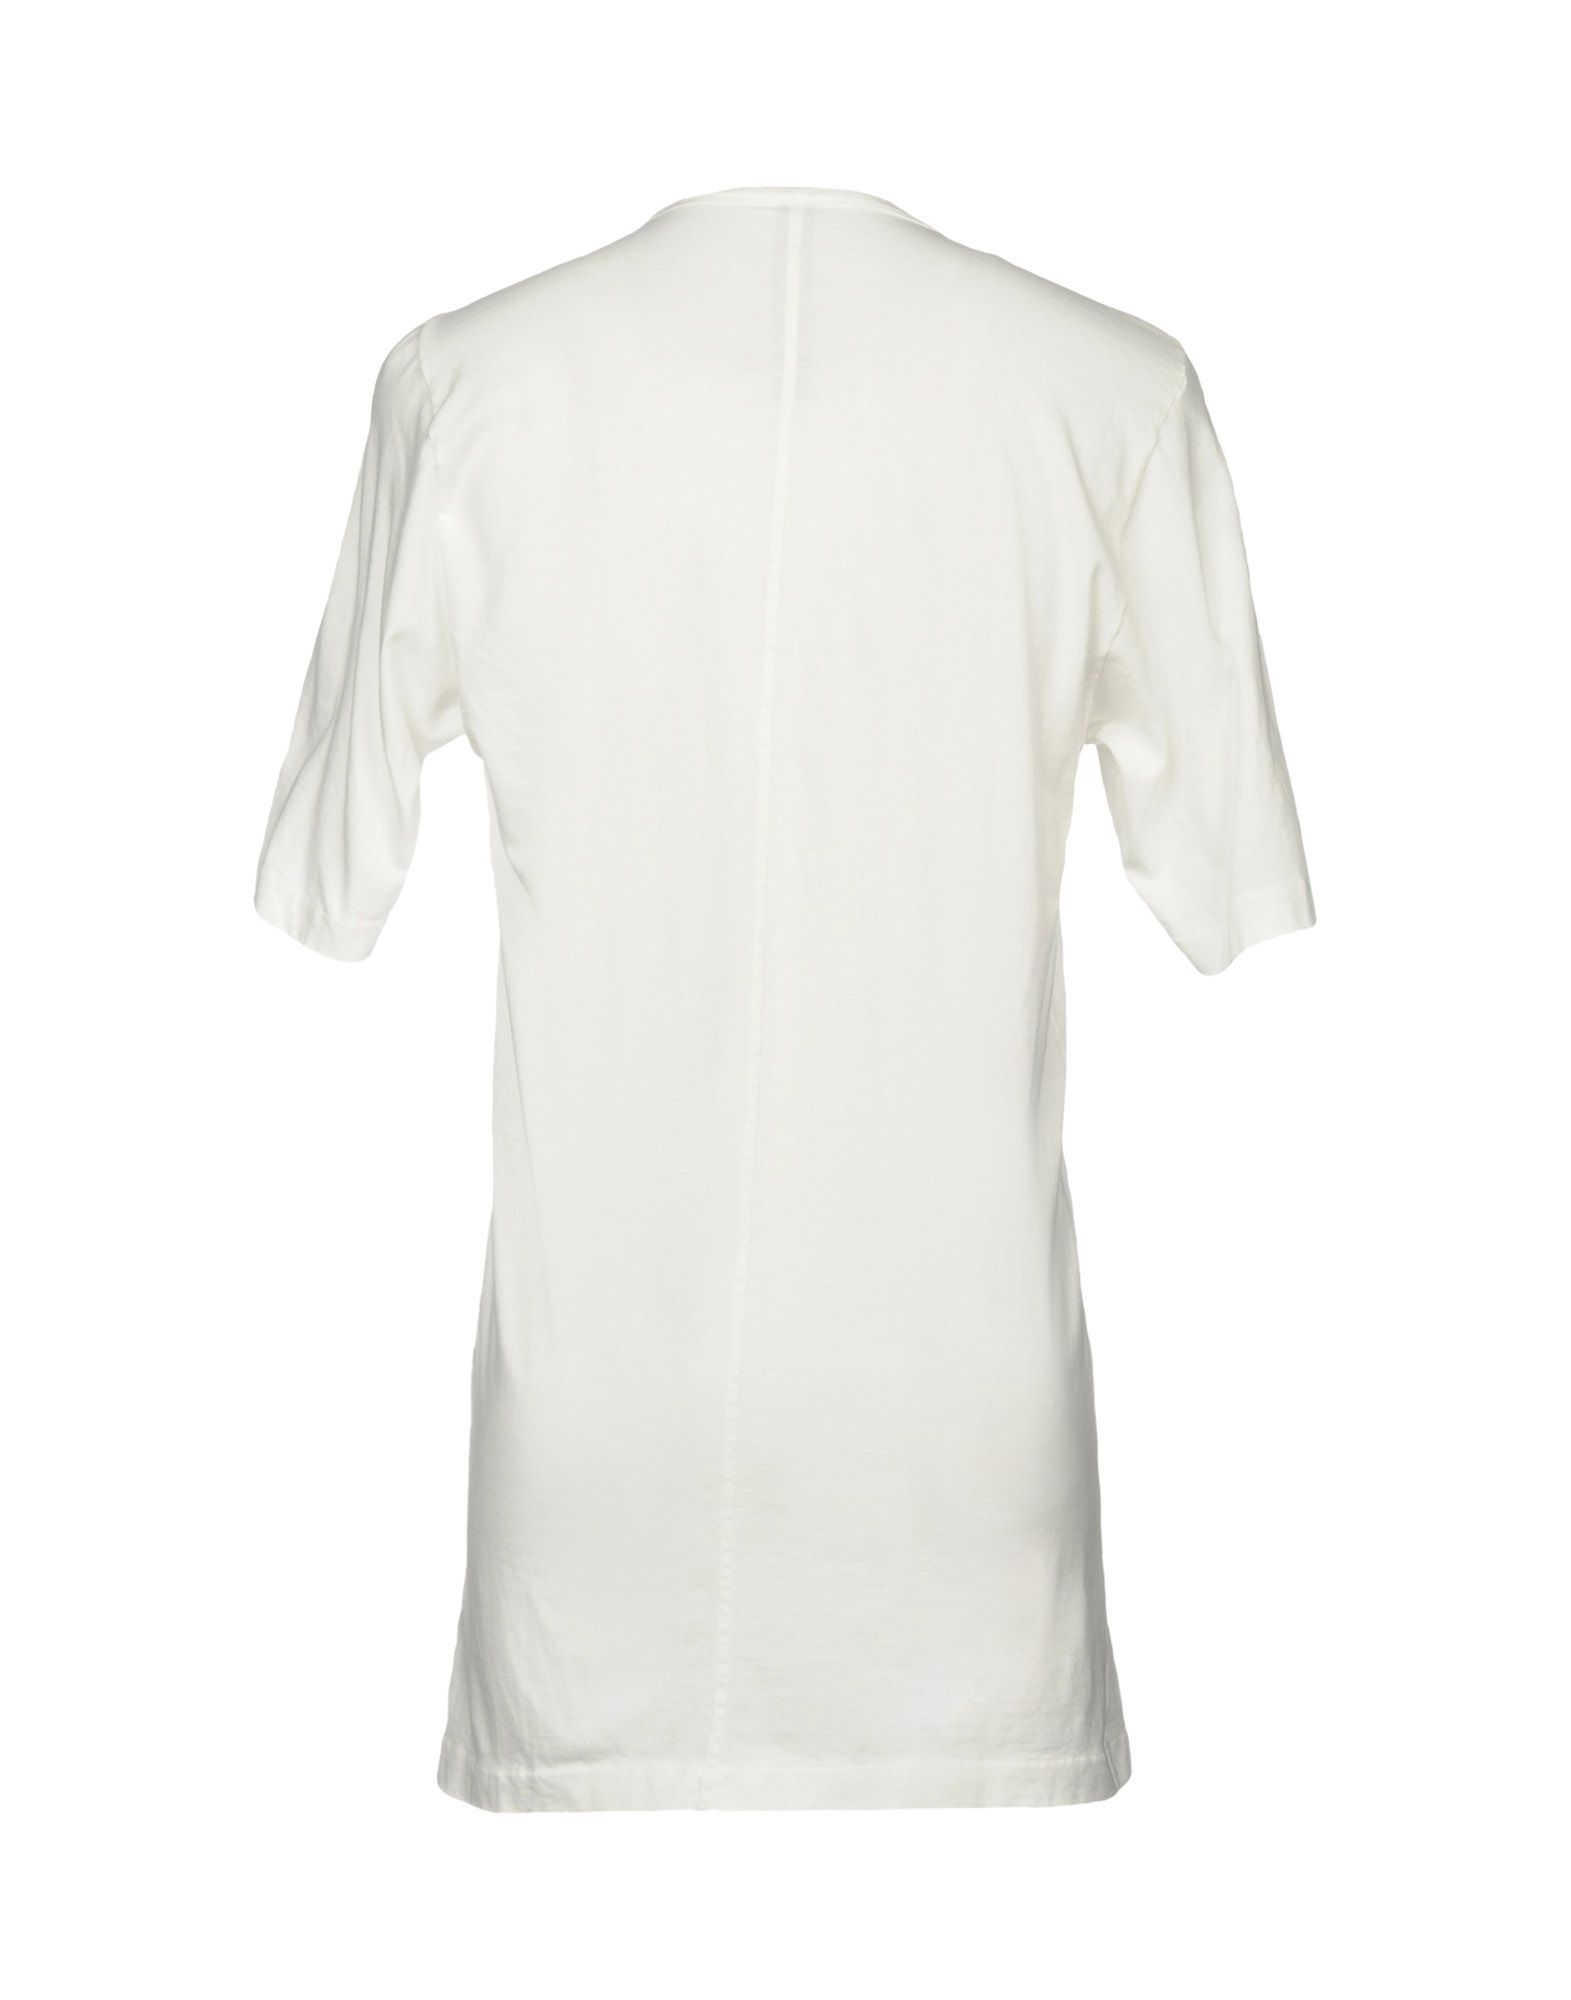 A T-Shirt buon mercato A buon mercato T-Shirt A Overcome Uomo - 12139486PD 1469af